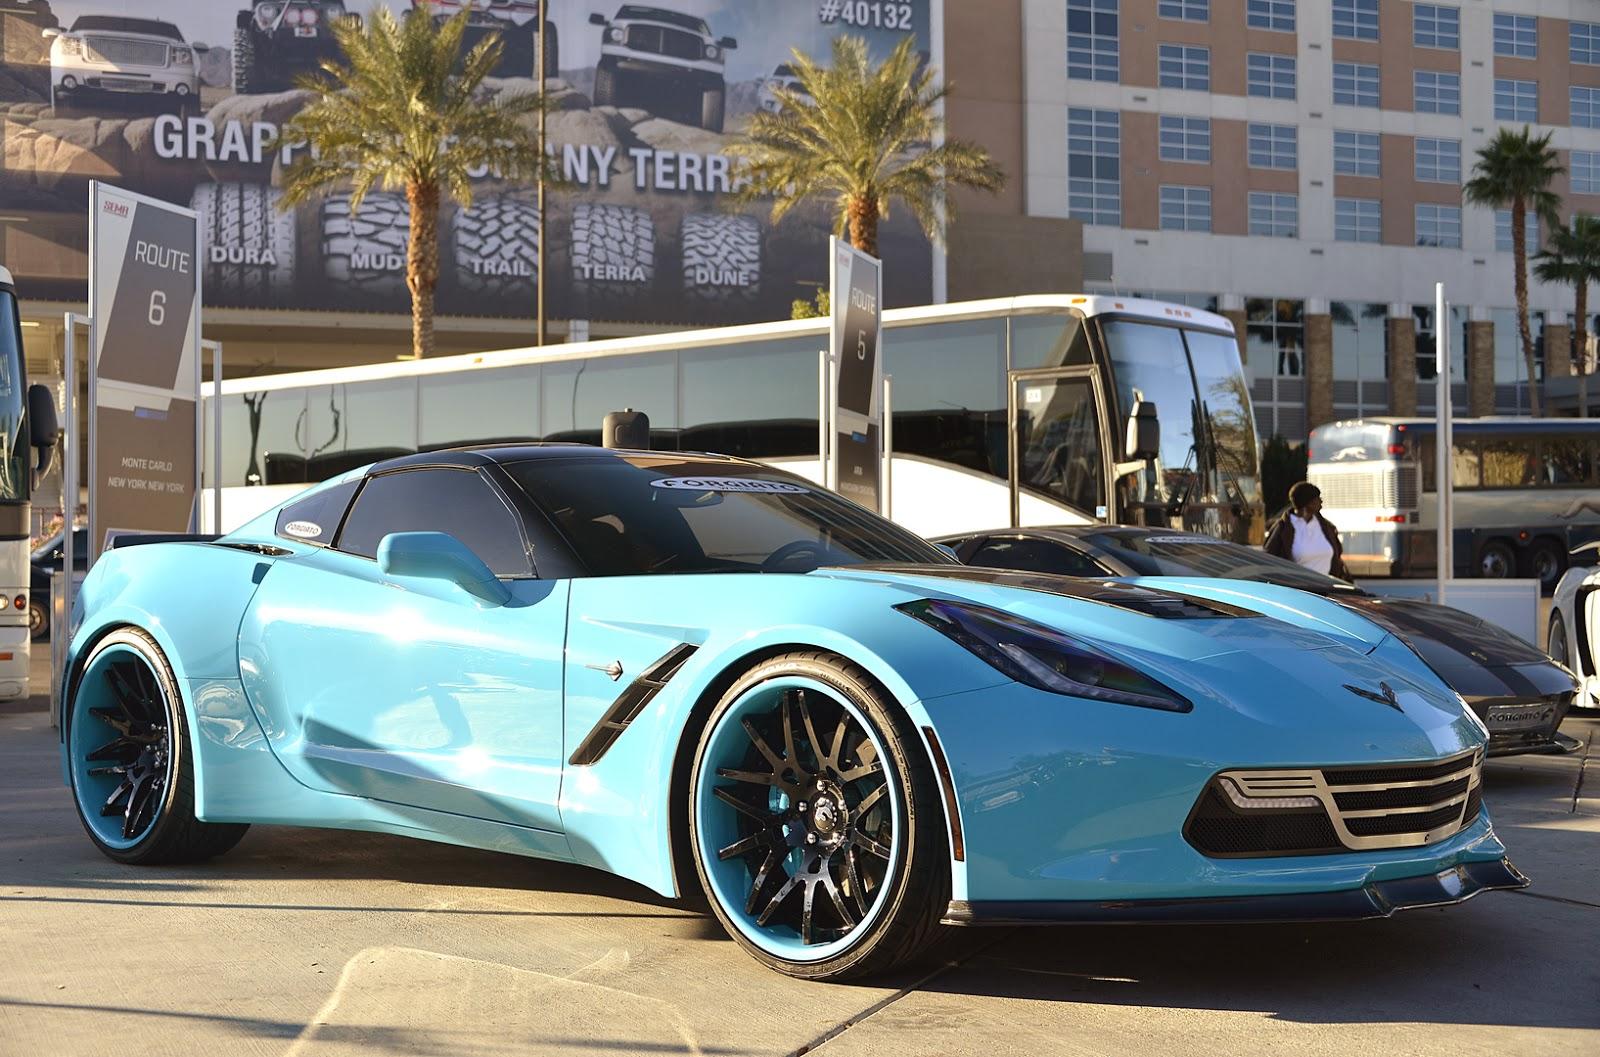 More Pictures Of Forgiato's Wide Body Corvette C7 : ebeasts com